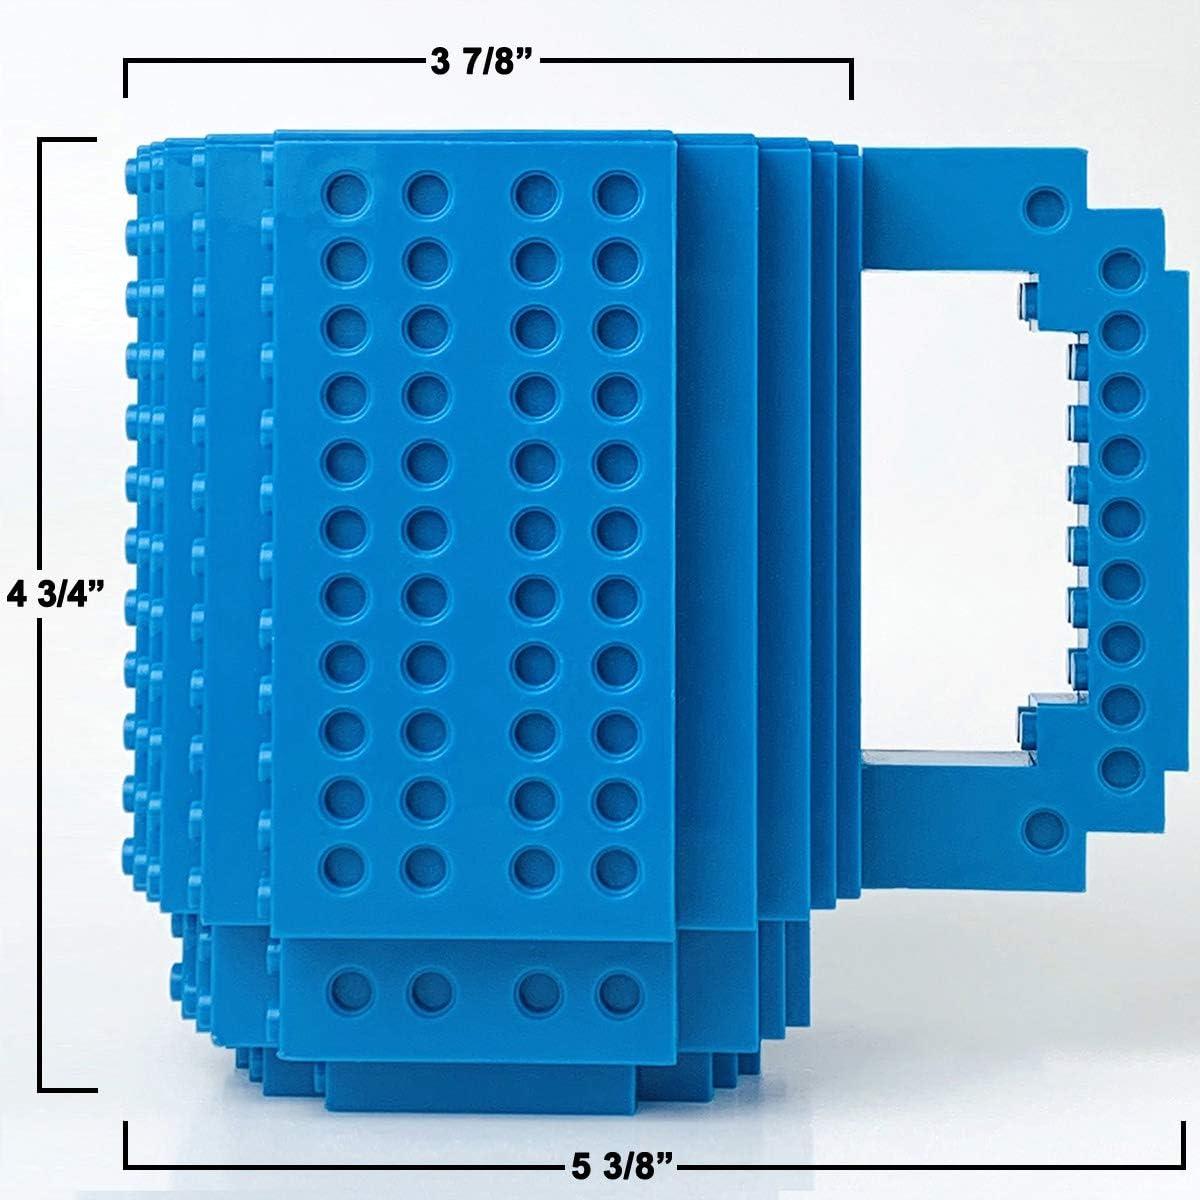 Tmango Upgraded Build-on Bricks Mug with a Pack of Blocks Novelty Puzzle Cup for Kids Creative DIY Building Blocks Coffee Mug Men or Women Xmas Birthday Gift Black